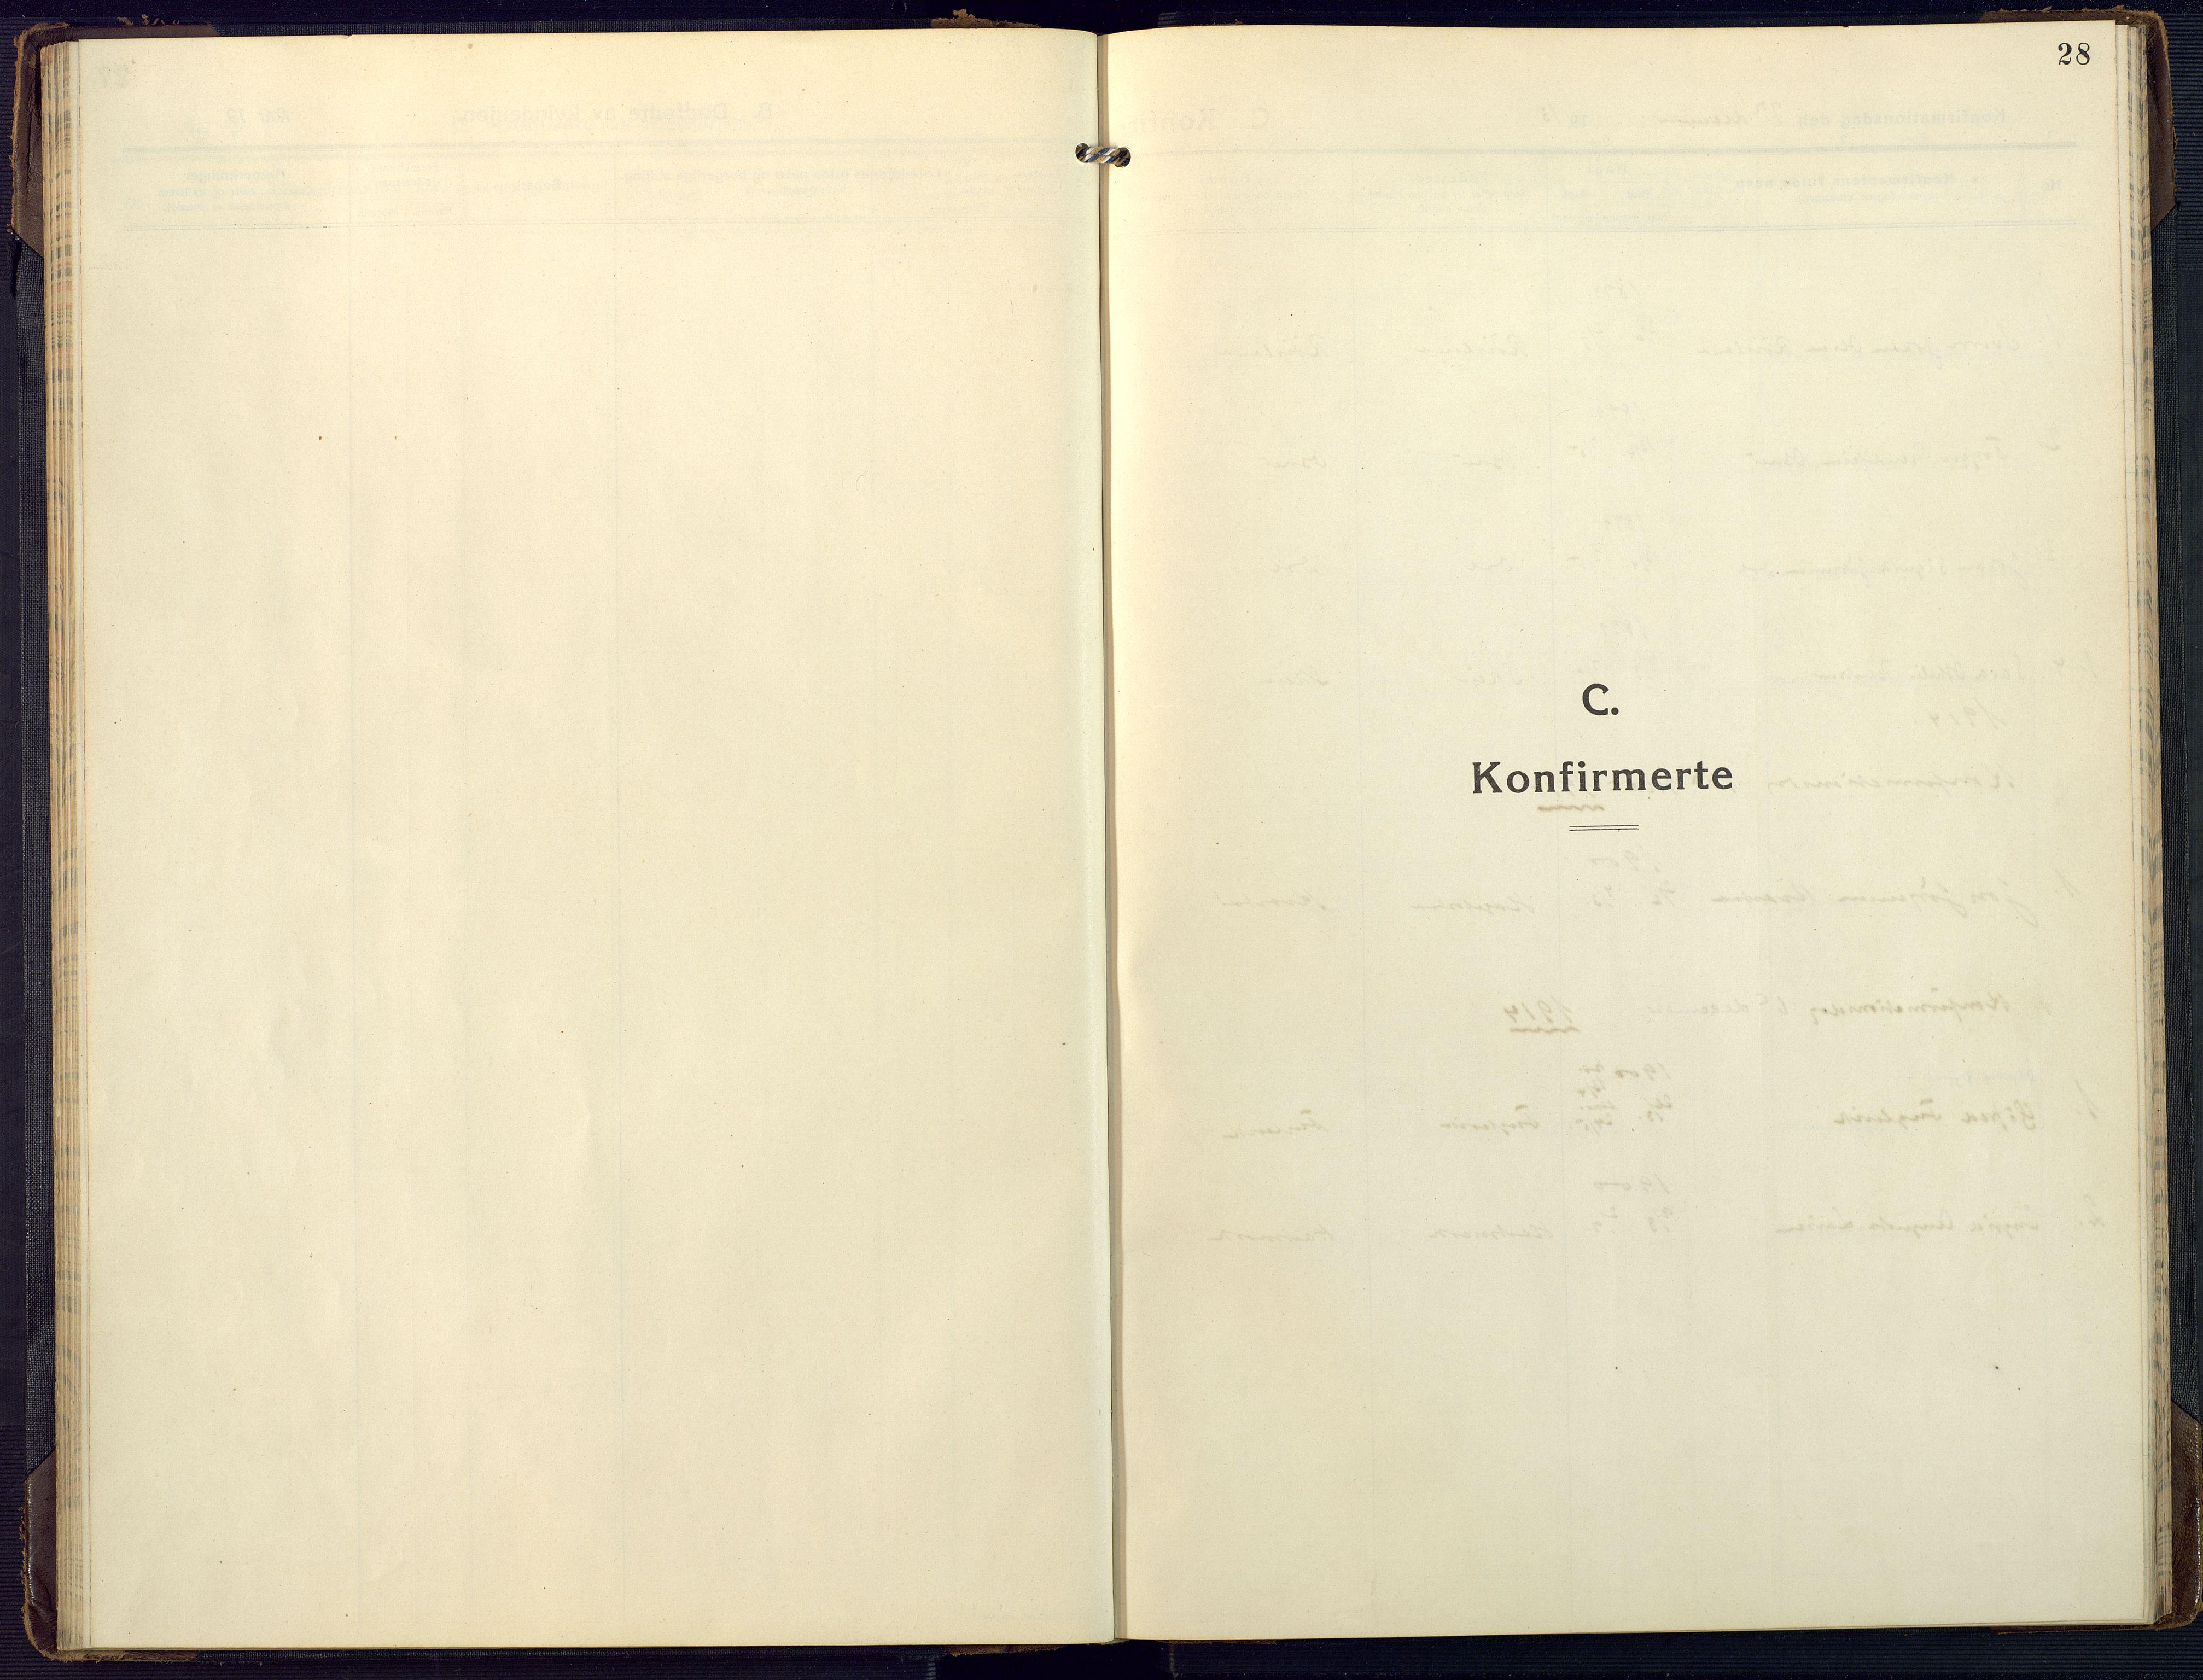 SAK, Mandal sokneprestkontor, F/Fa/Fab/L0003: Ministerialbok nr. A 3, 1913-1933, s. 28